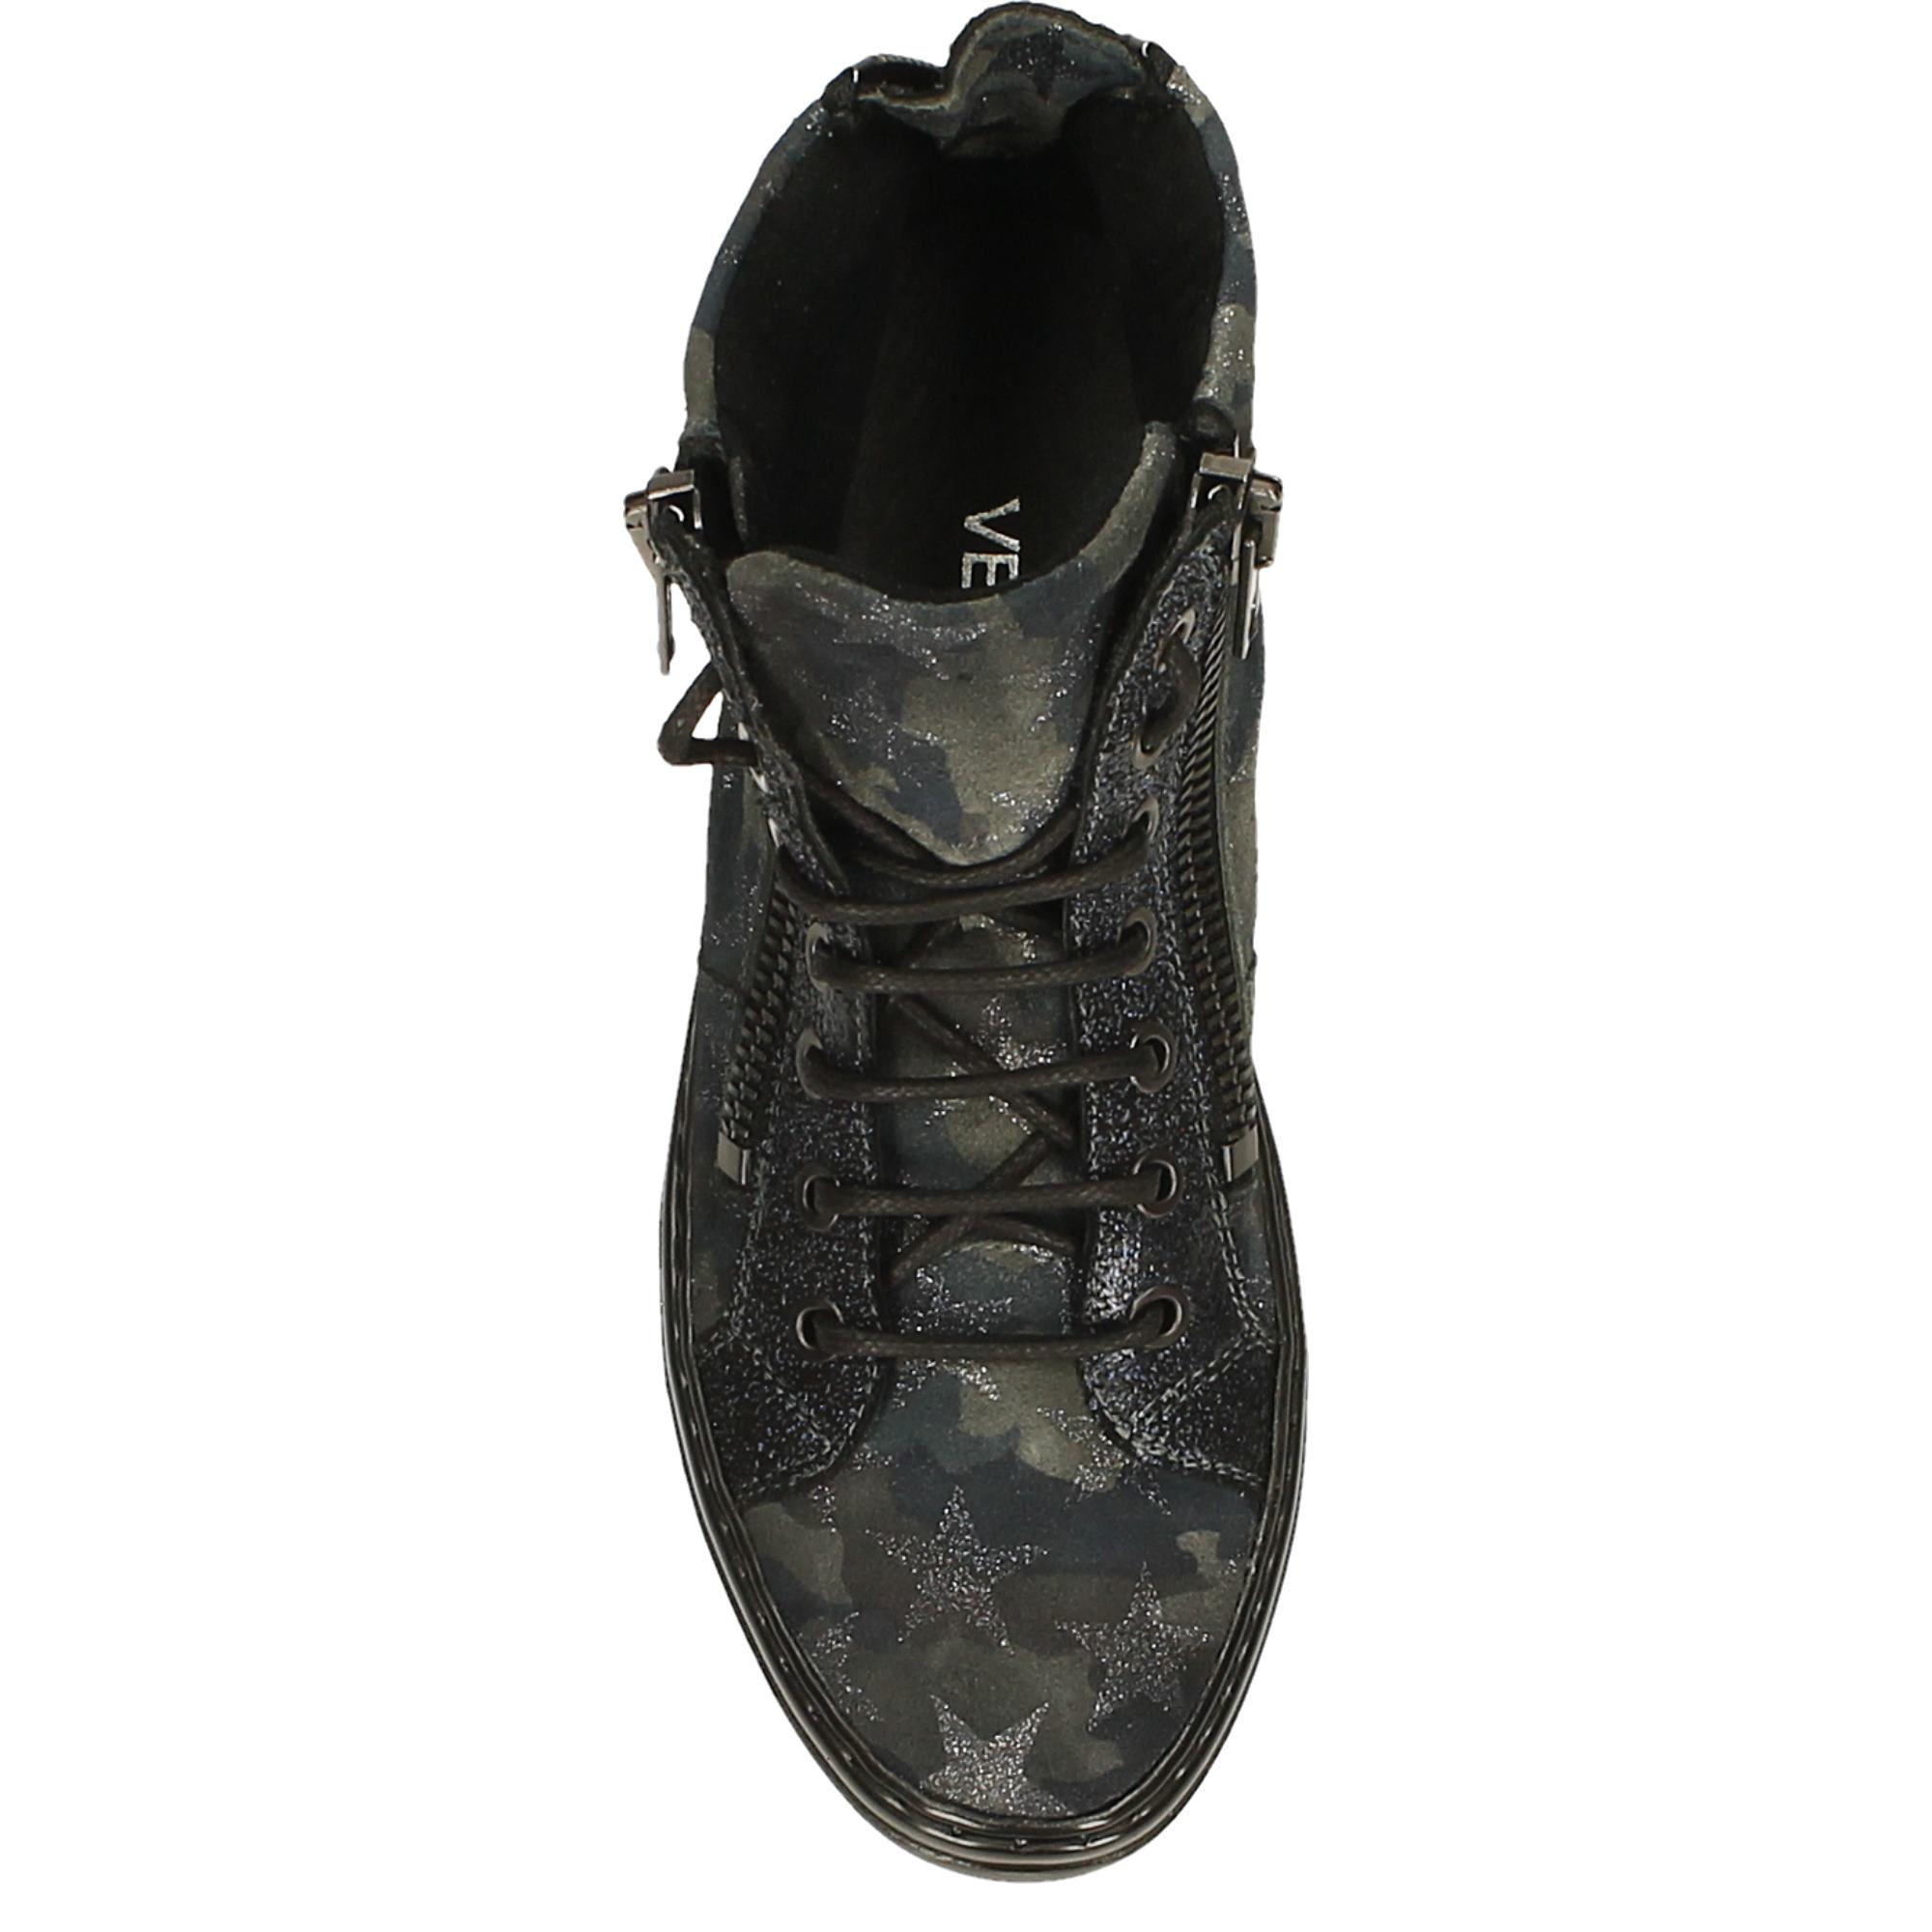 Botki Skorzane Venezia Pl Skora Zamszowa Wielobarwna Moro 2 Black Sneaker All Black Sneakers Sneakers